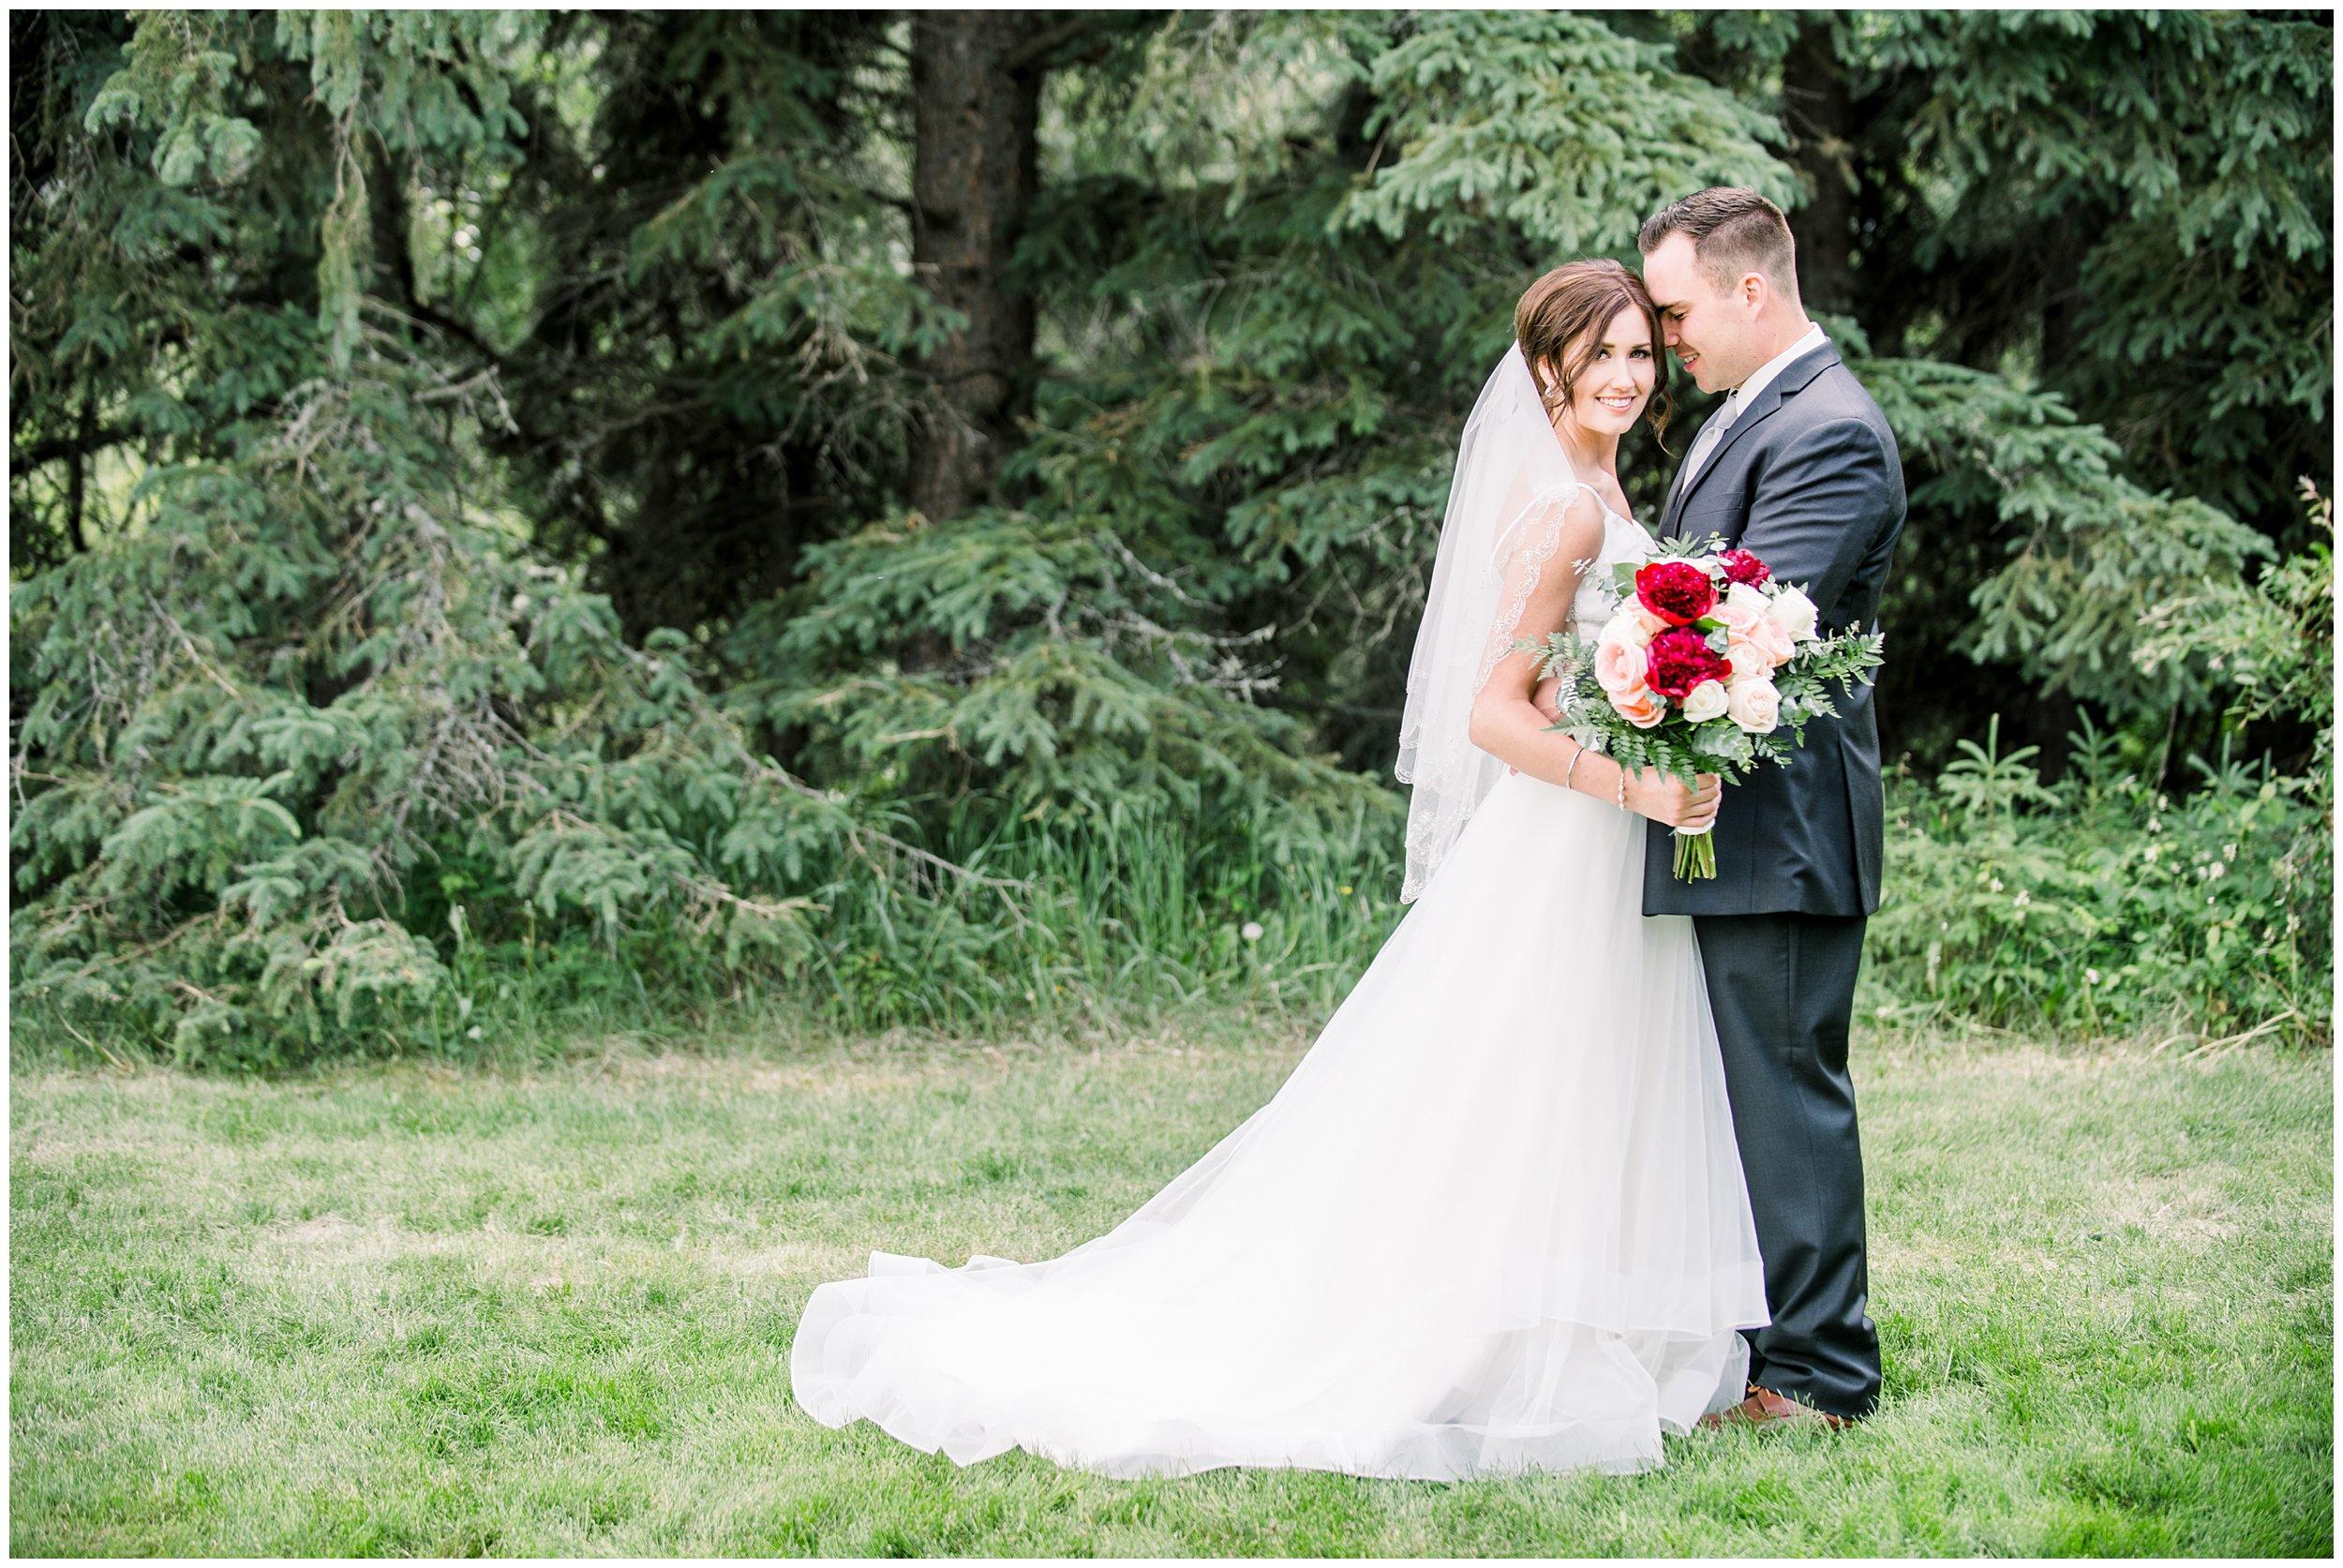 Alyssa-Poland-Photography_0617_alberta wedding.jpg